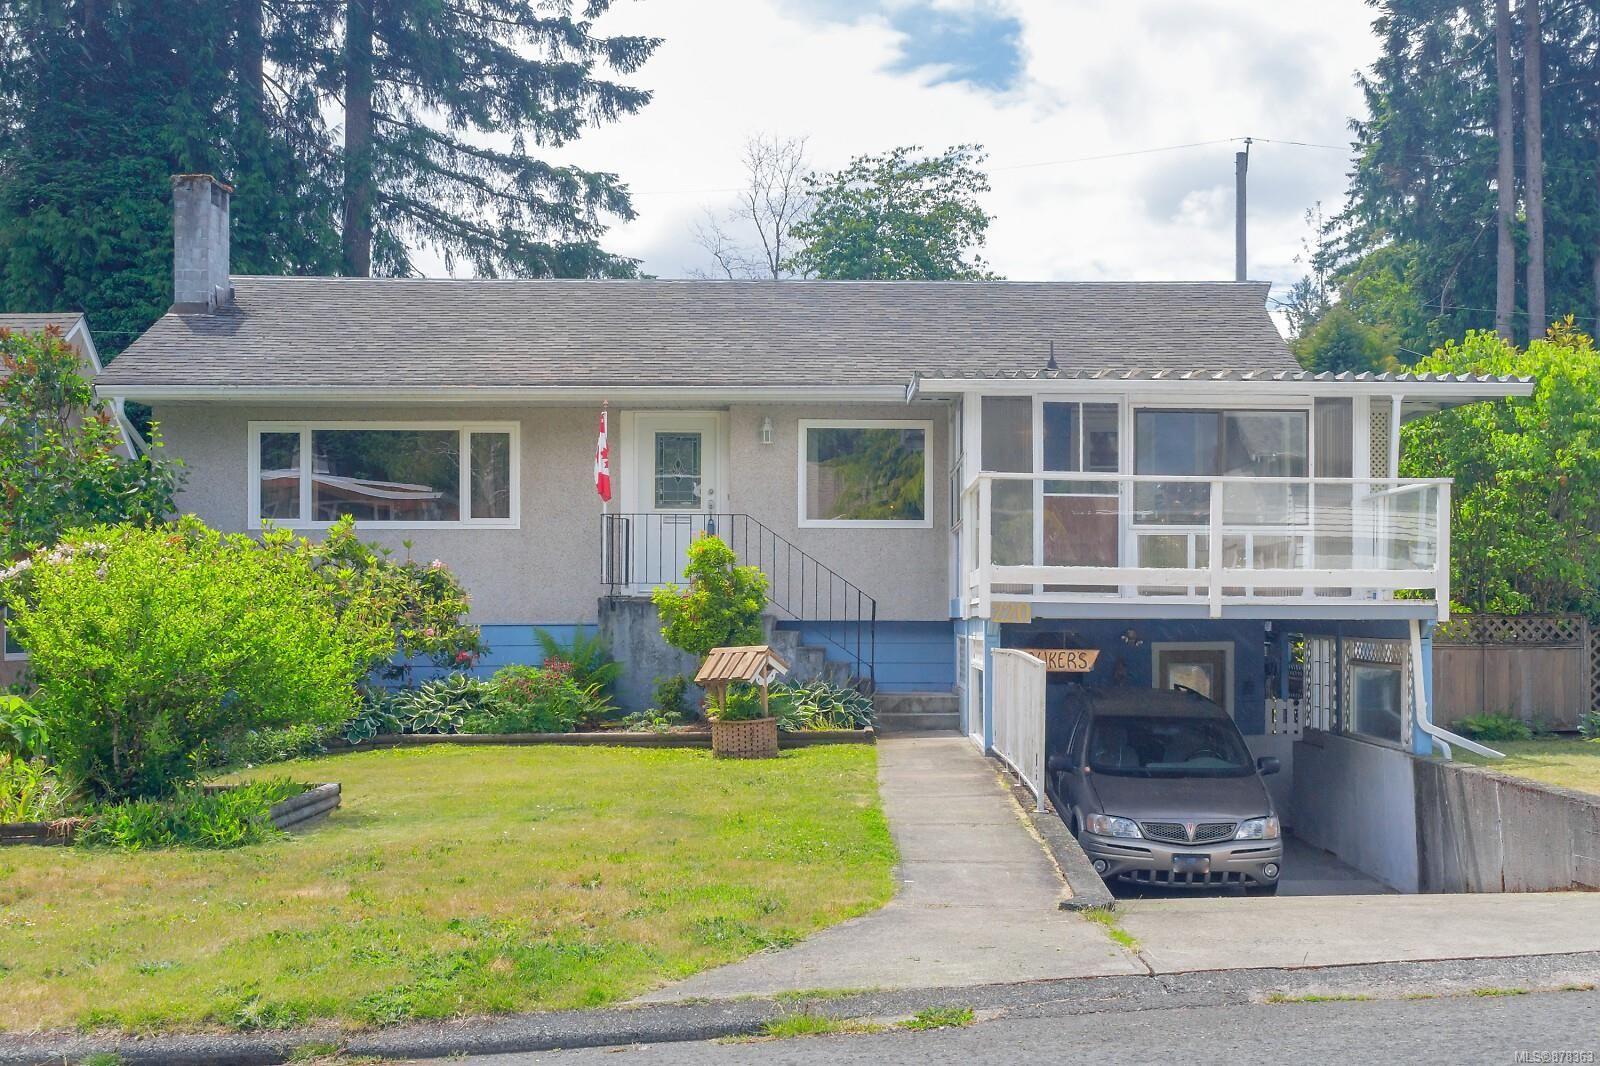 Main Photo: 220 Dogwood Ave in : Du West Duncan House for sale (Duncan)  : MLS®# 878363